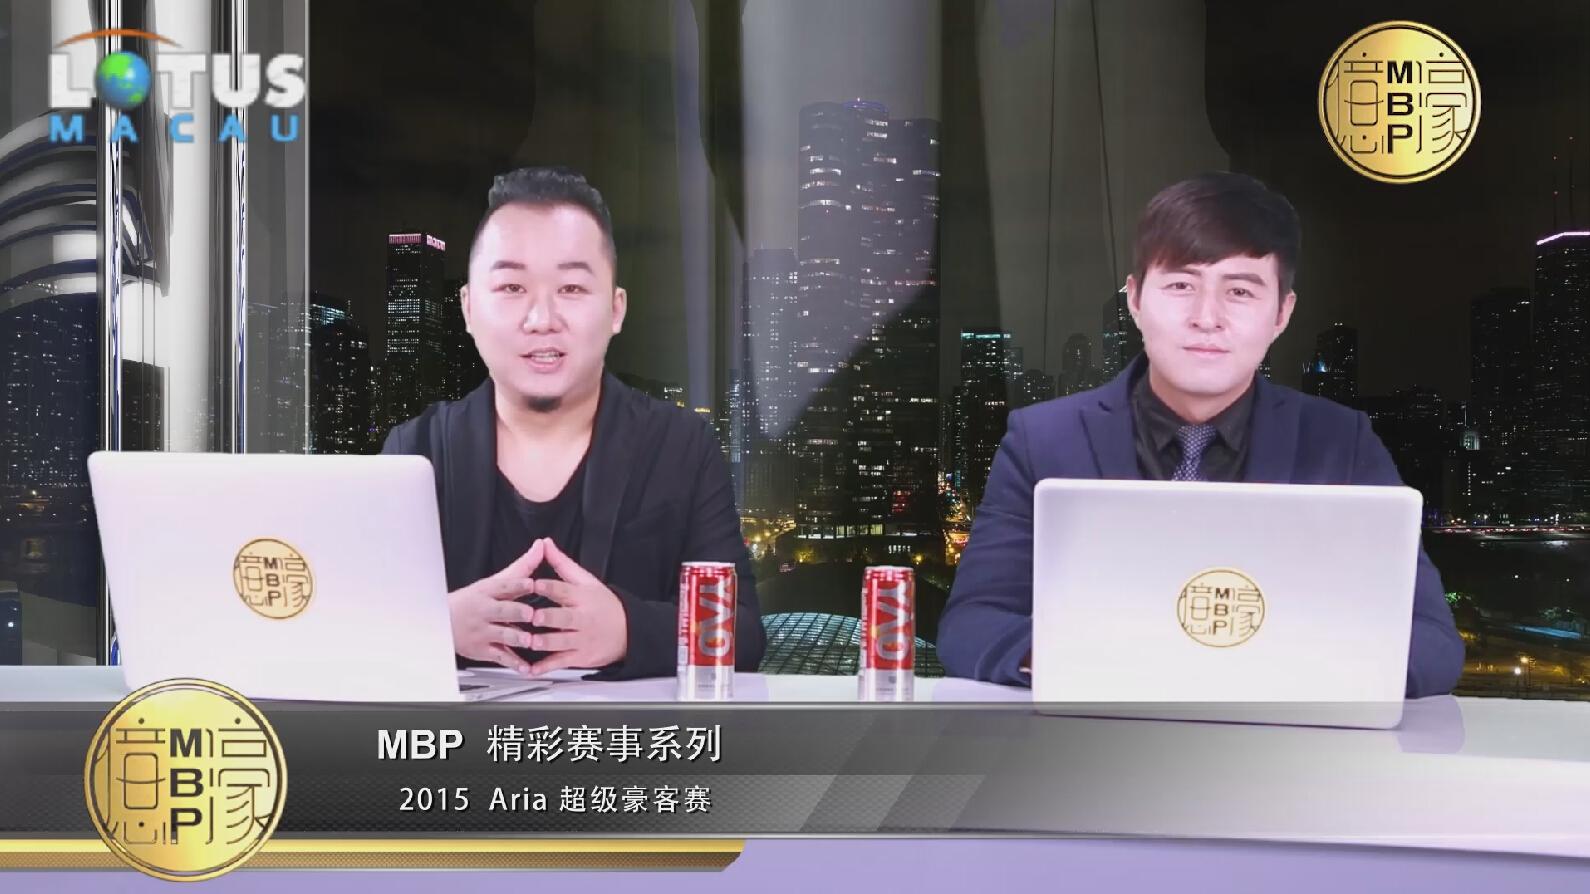 MBP精彩赛事系列第四期【Aria超级豪客赛】网络独家